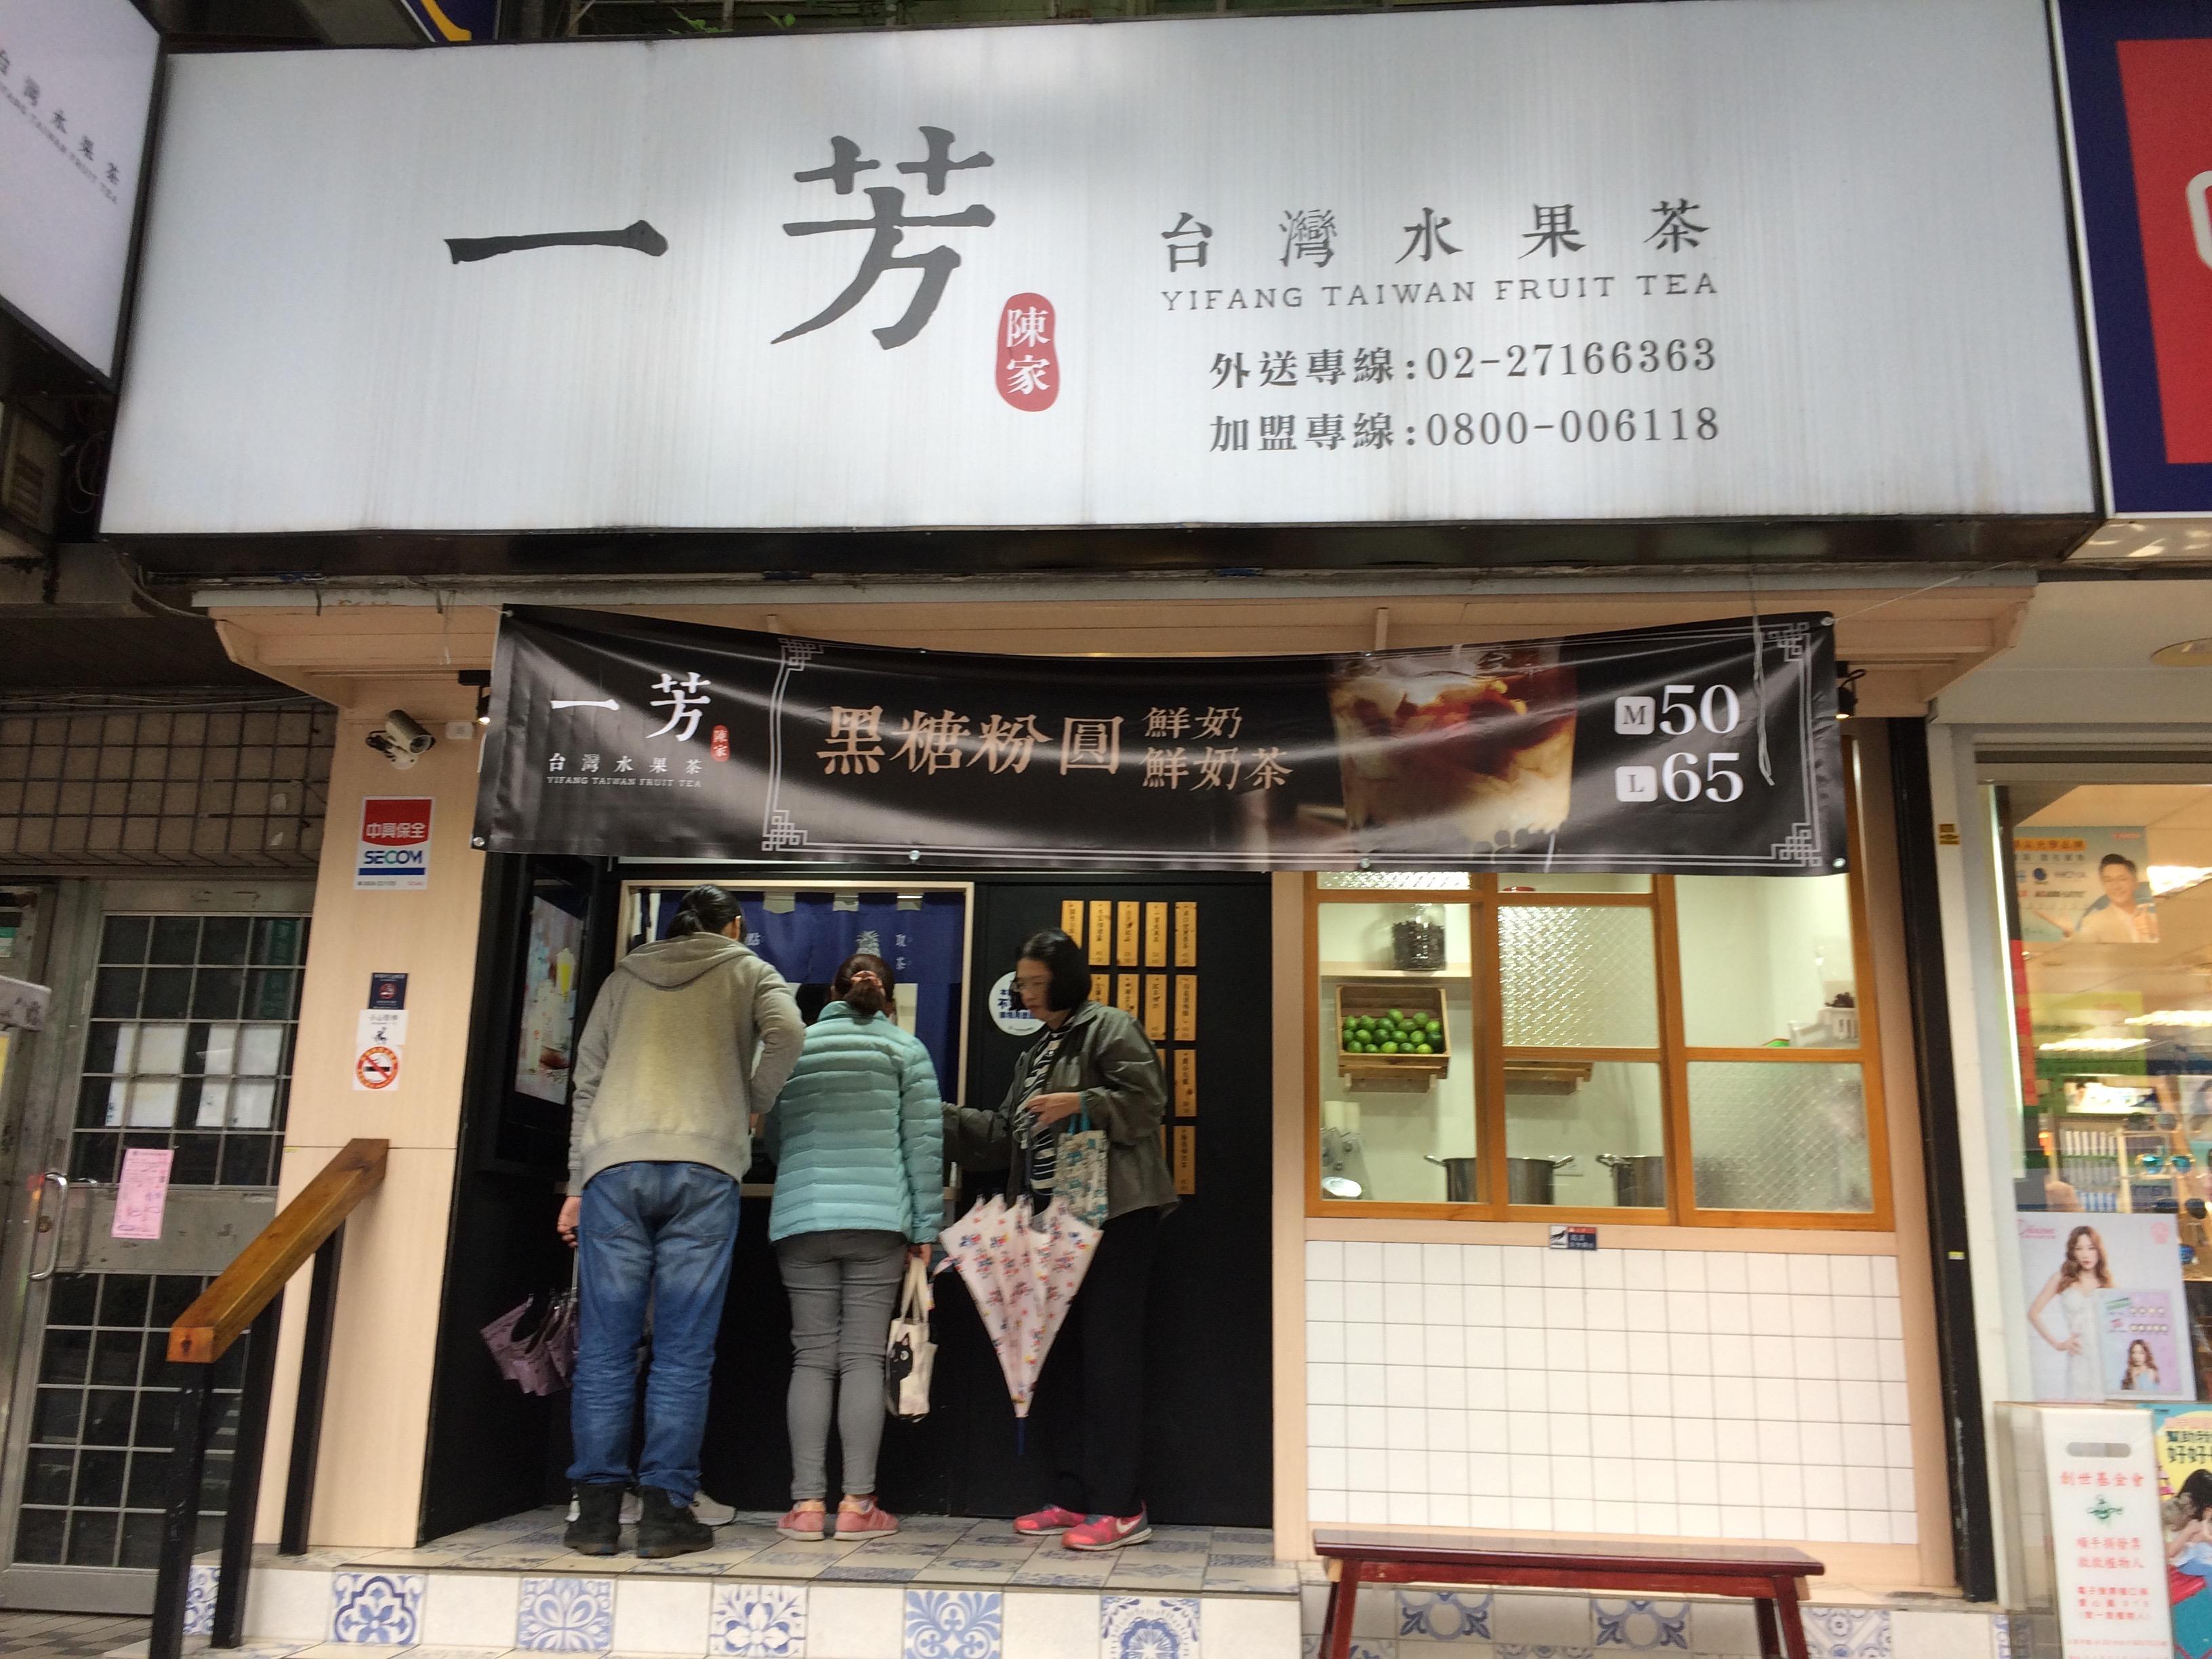 "Taiwan_drinkstand_yifang_002"""""